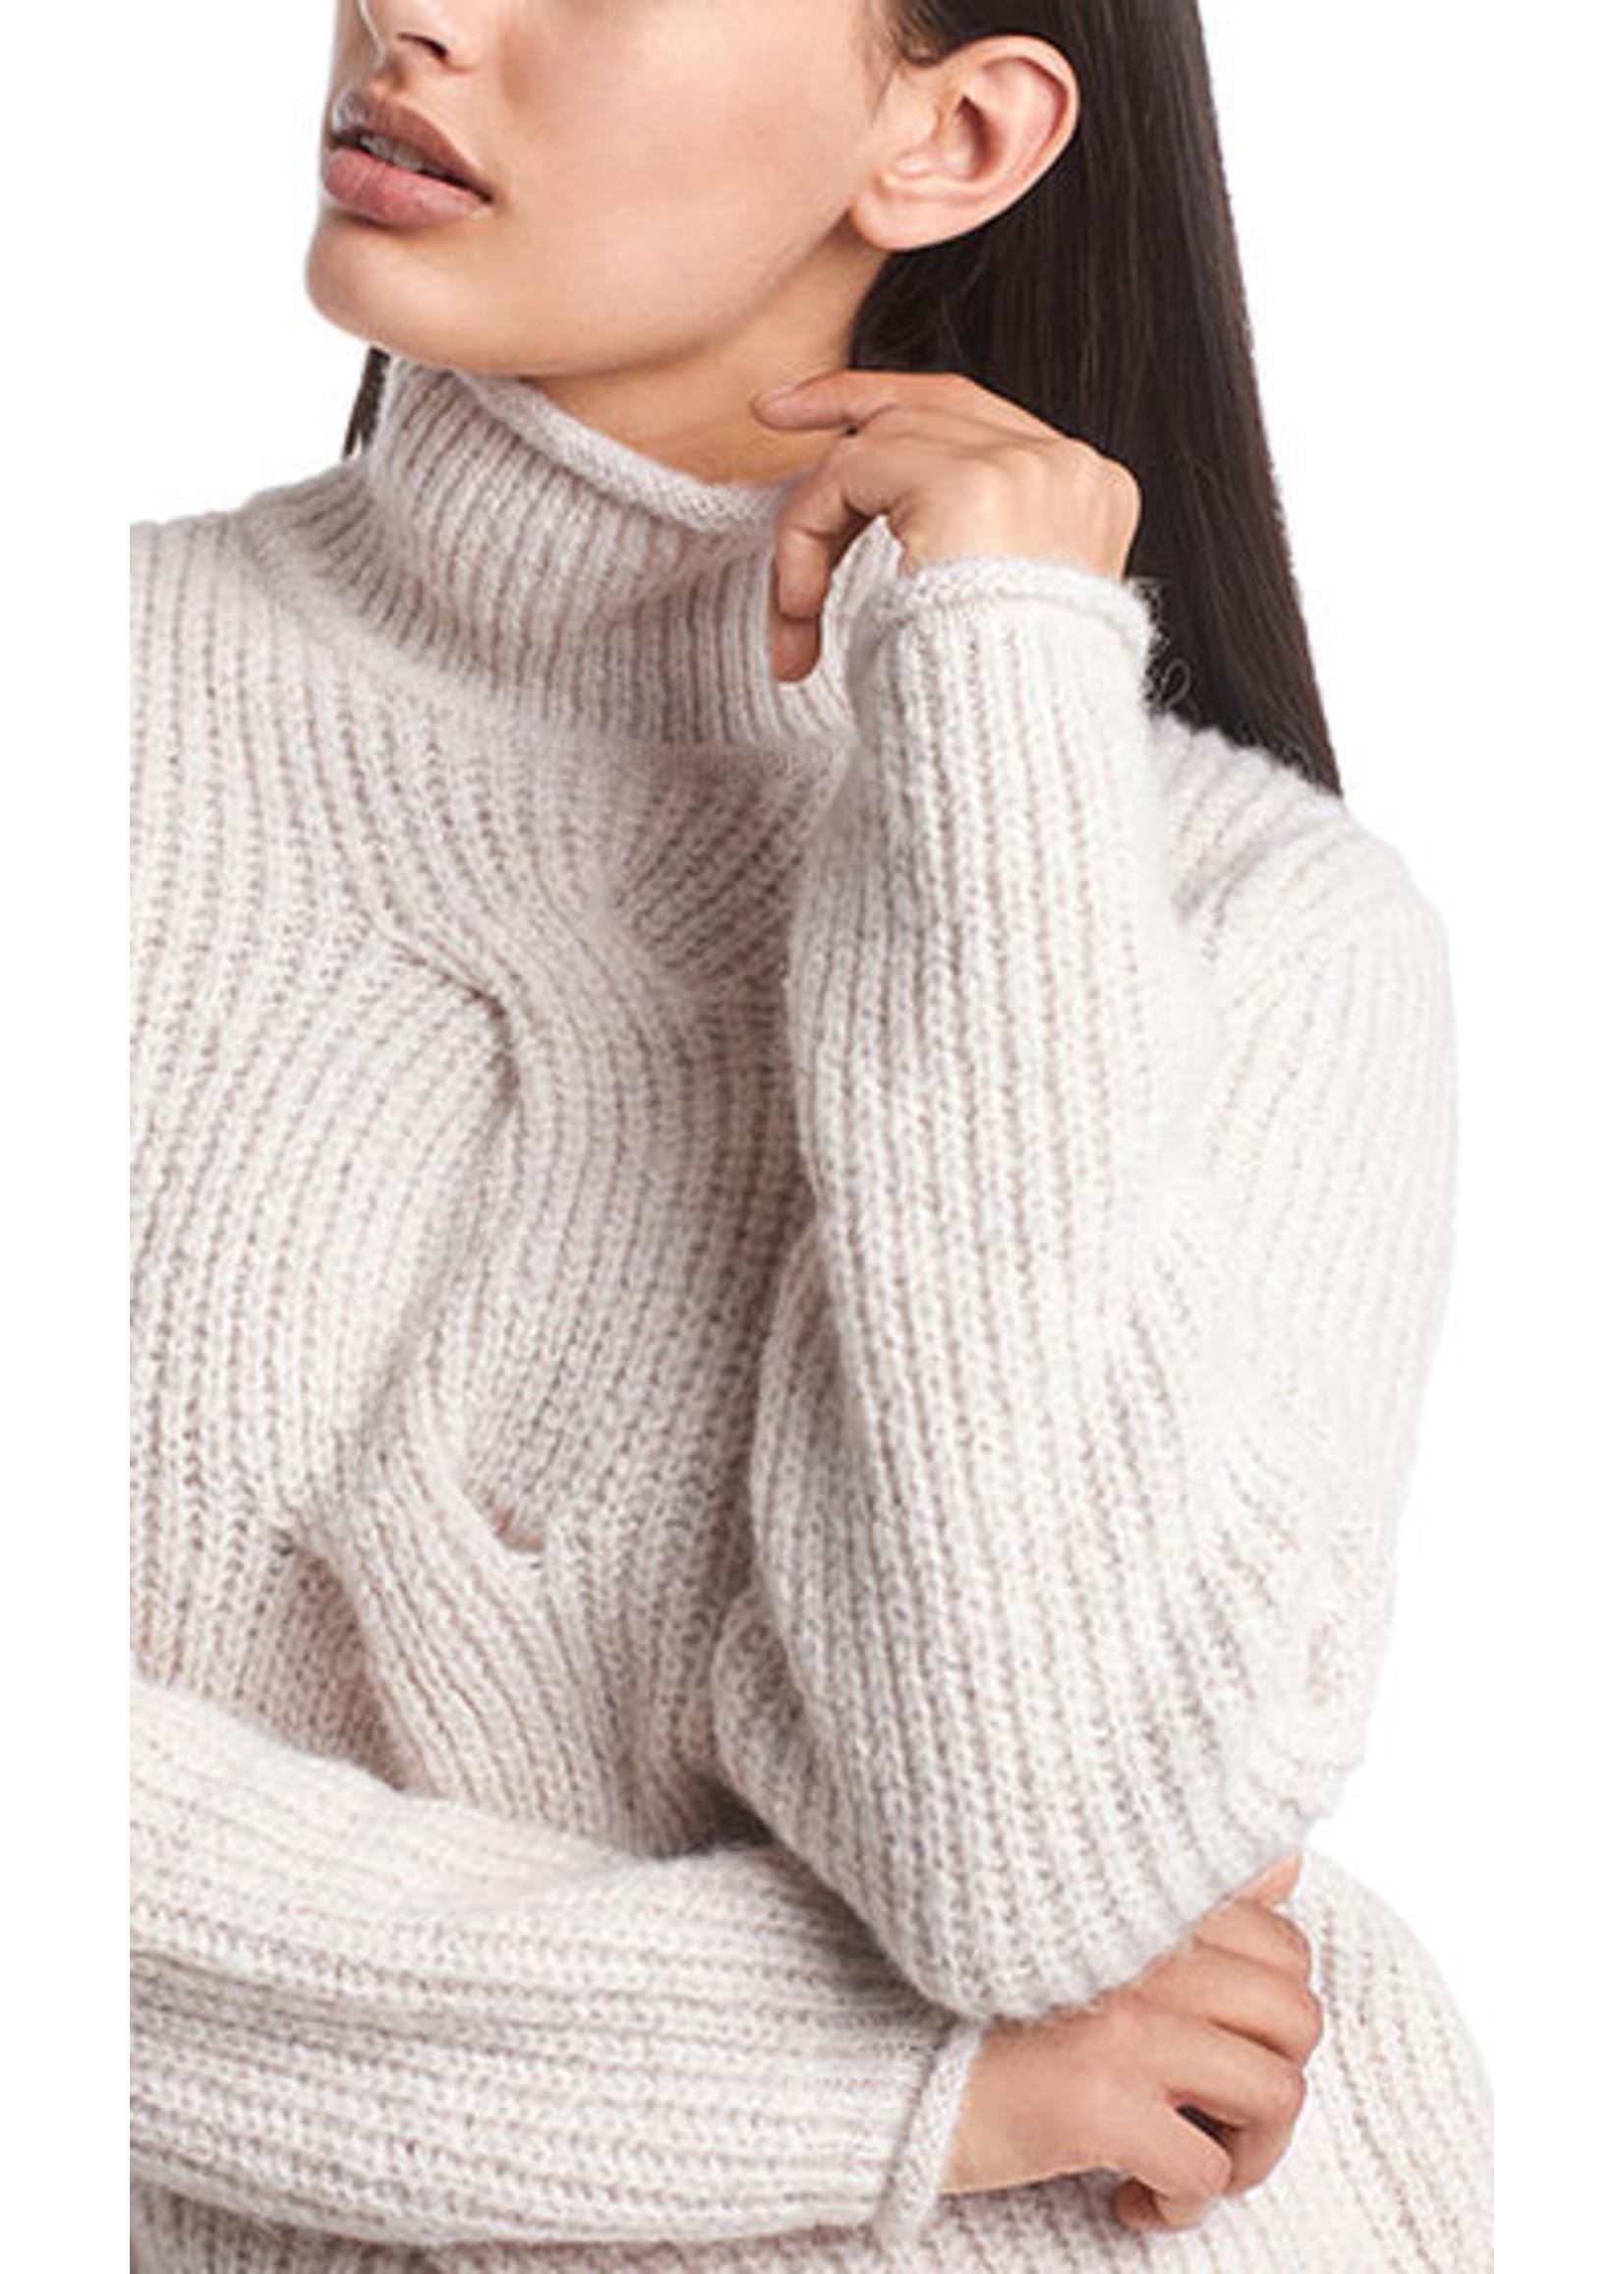 Sweater RC 41.54 M46 bisque